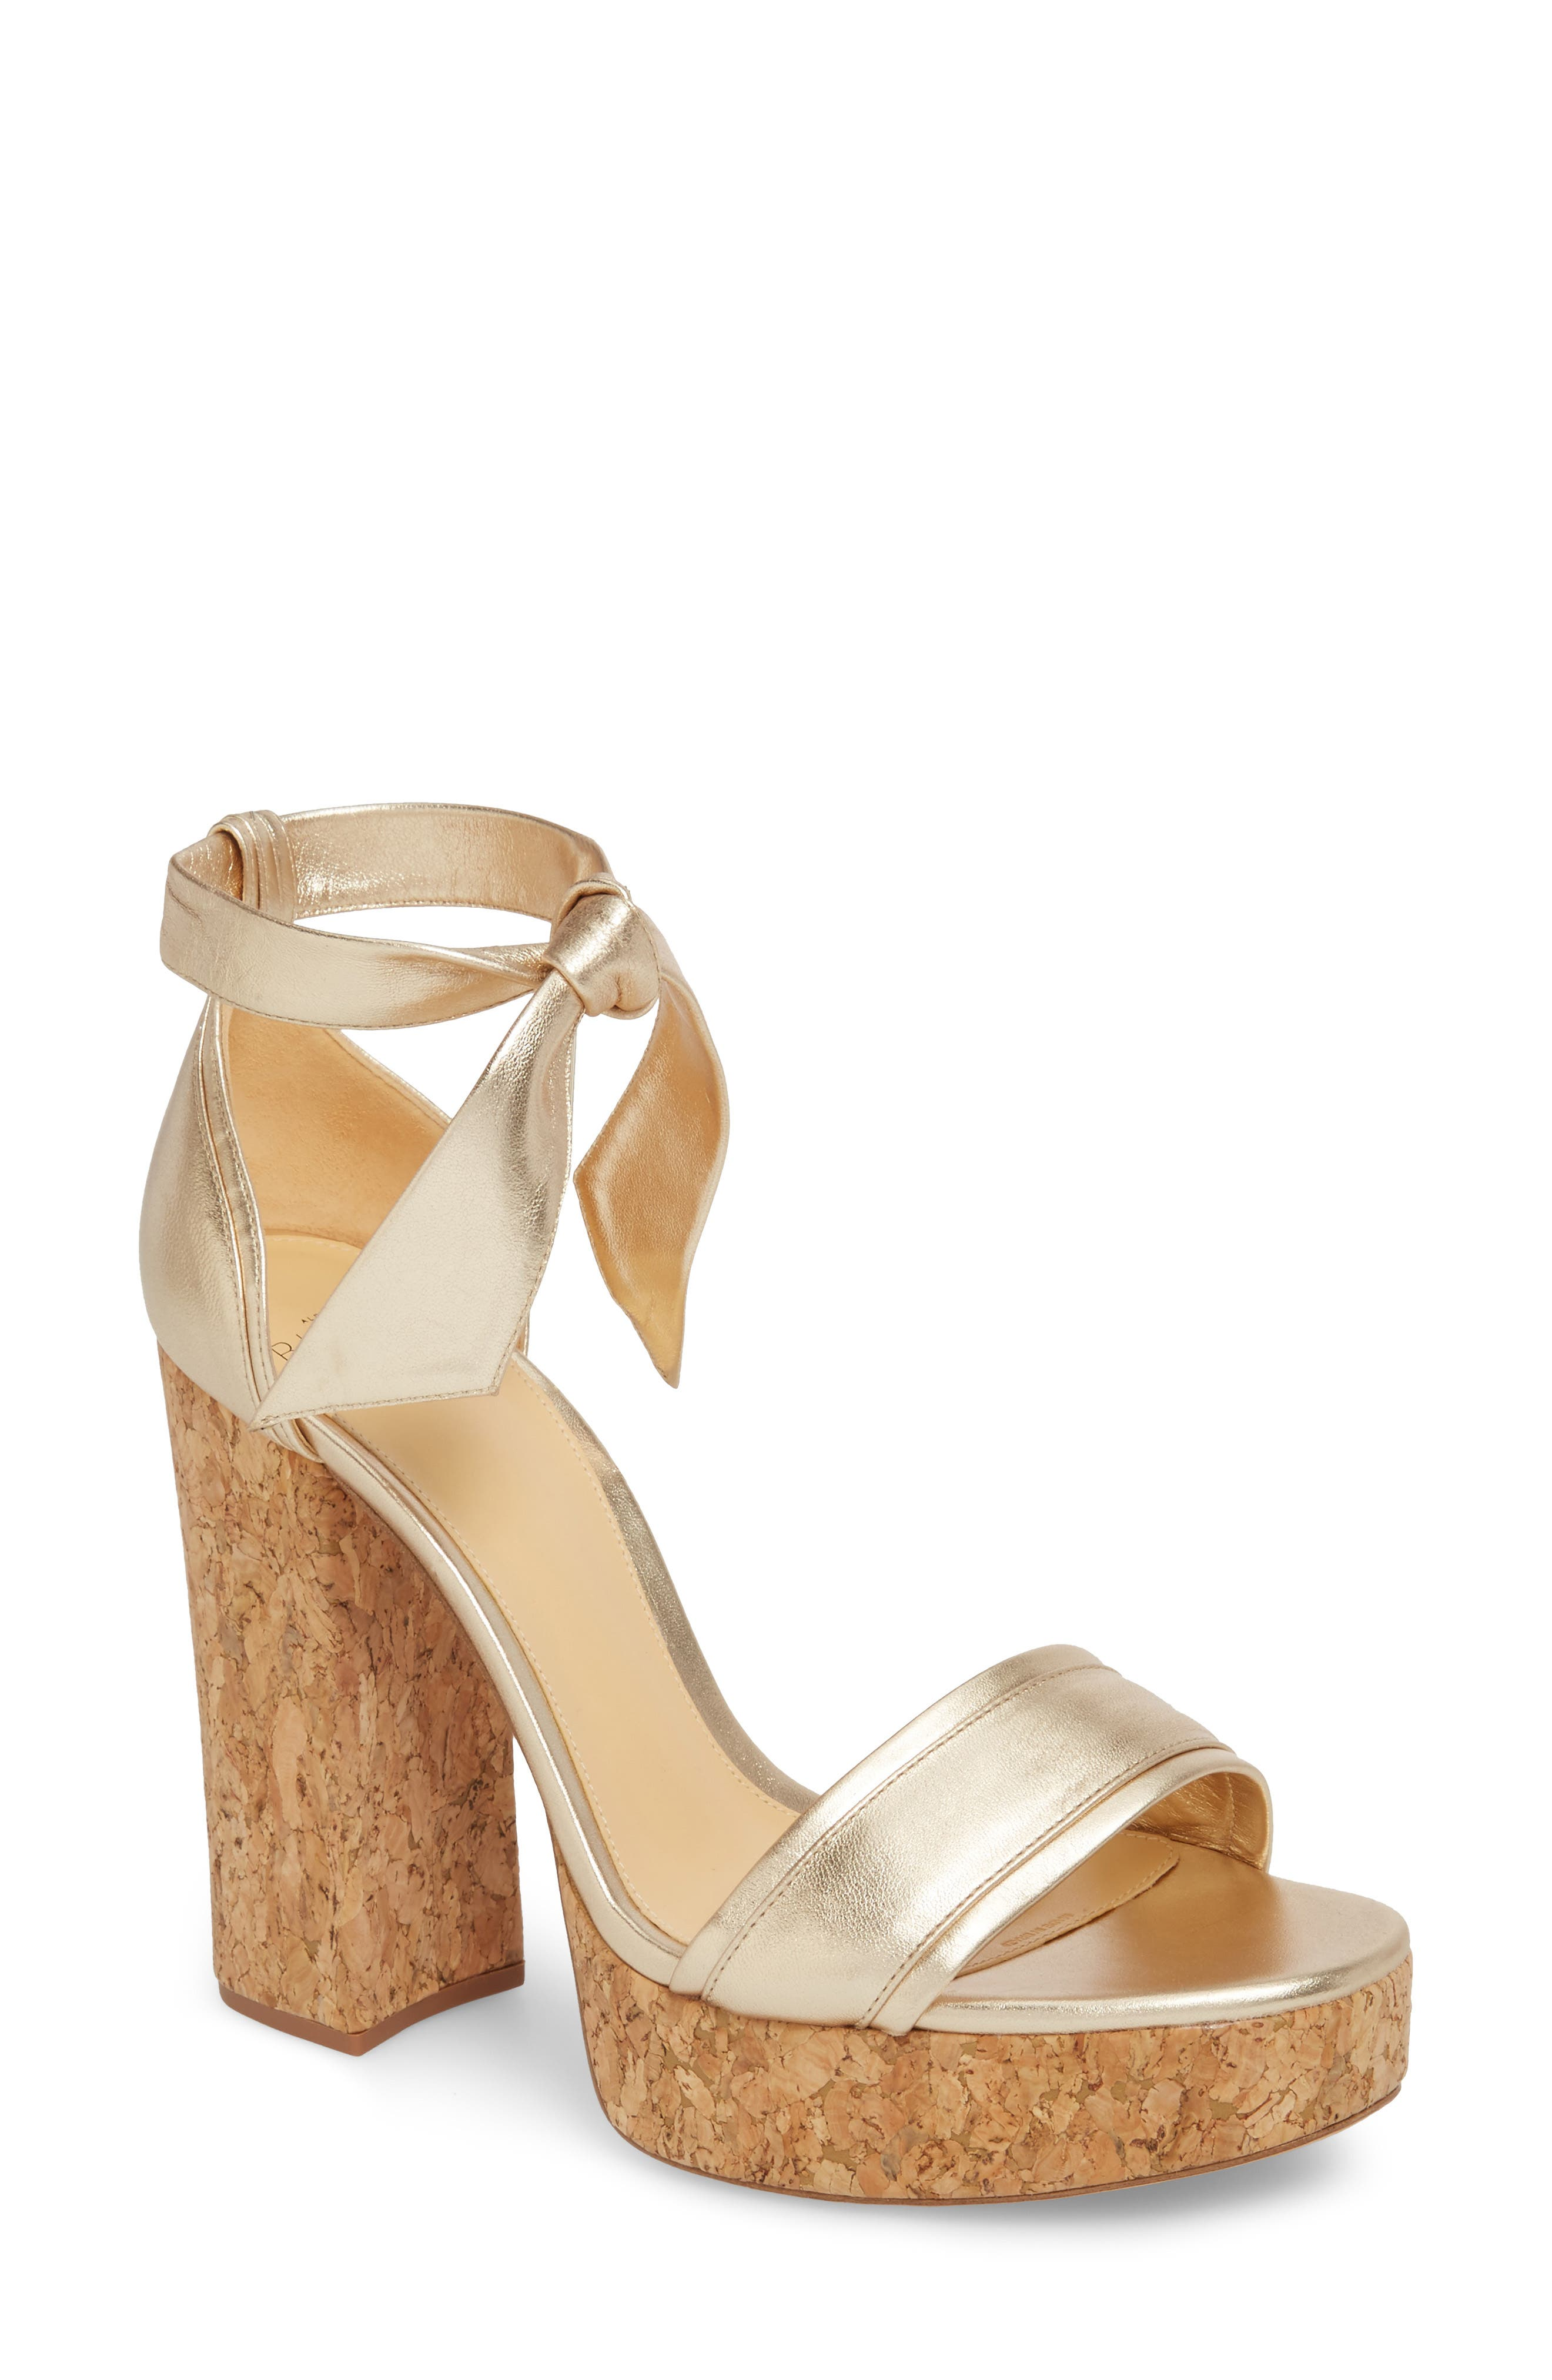 Celine Ankle Tie Platform Sandal by Alexandre Birman